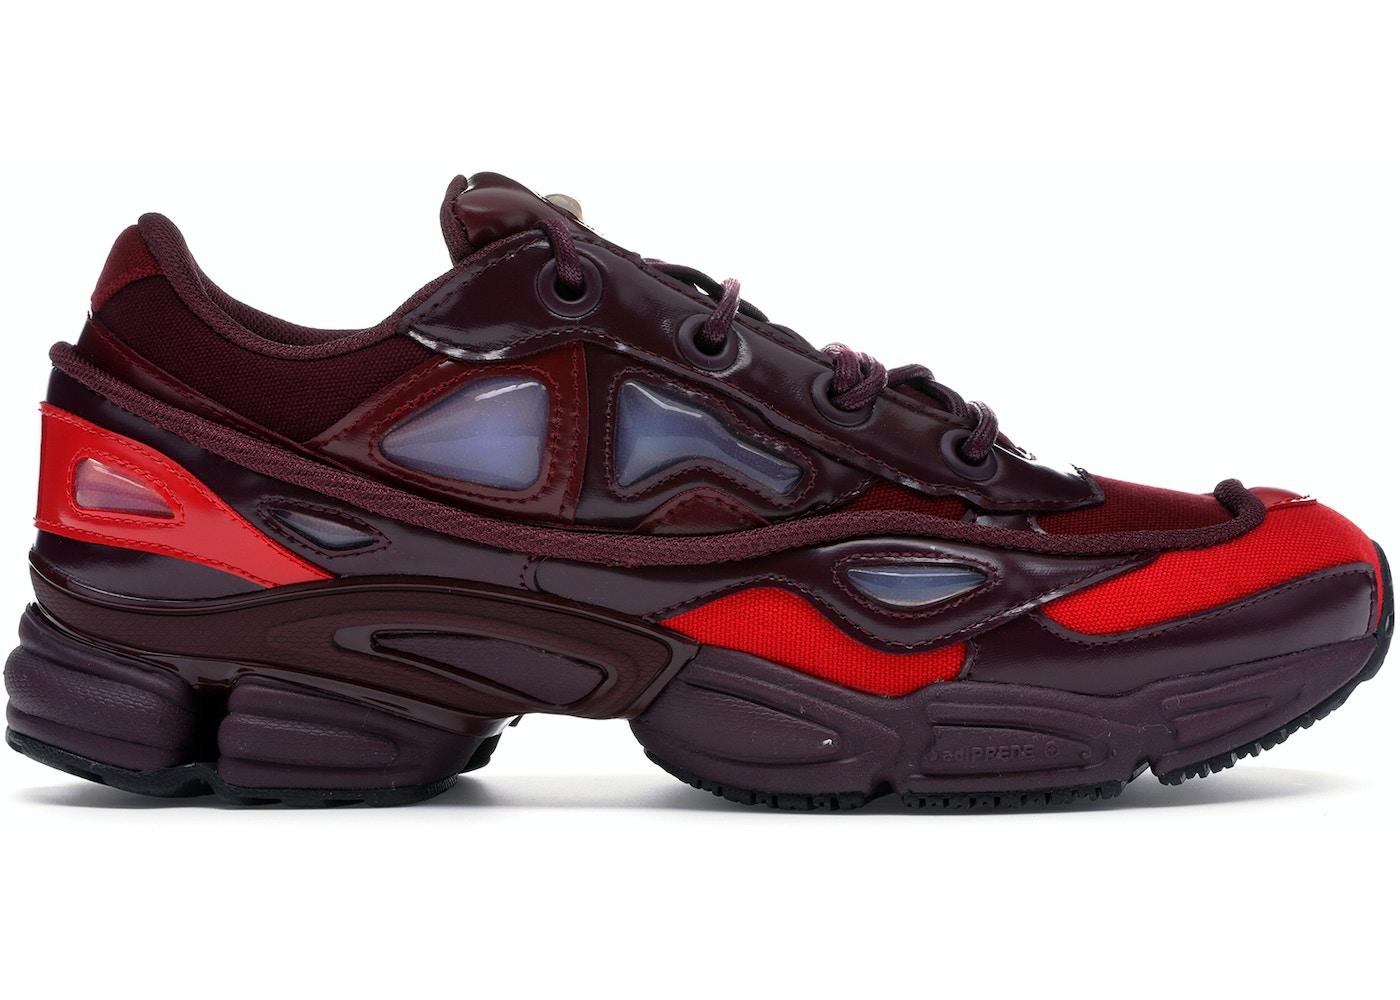 buy popular 86dac d3400 adidas Ozweego 3 Raf Simons Burgundy